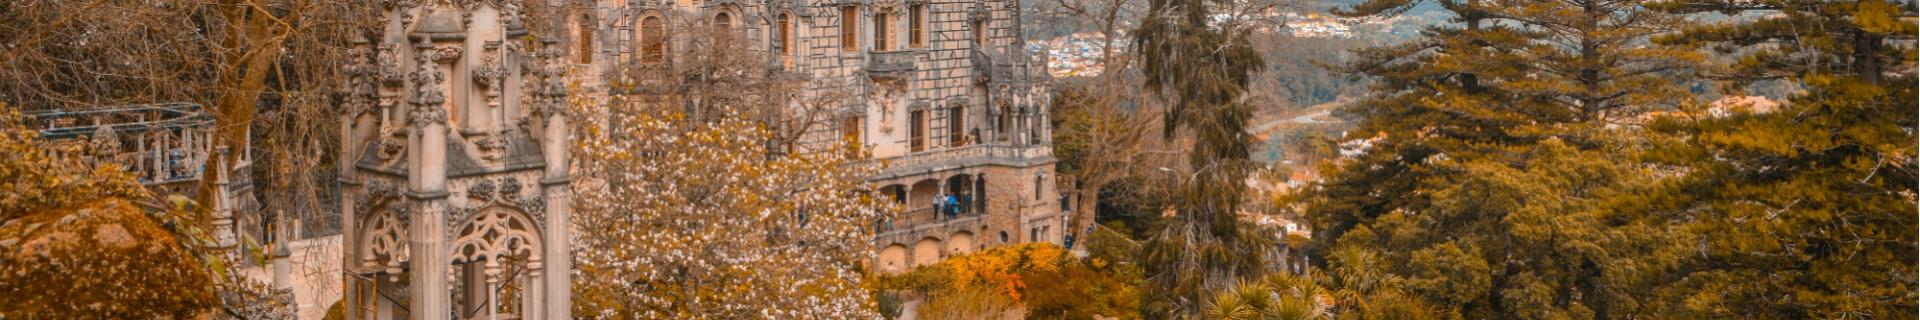 Atlas Obscura: 5 interesting spots in Portugal